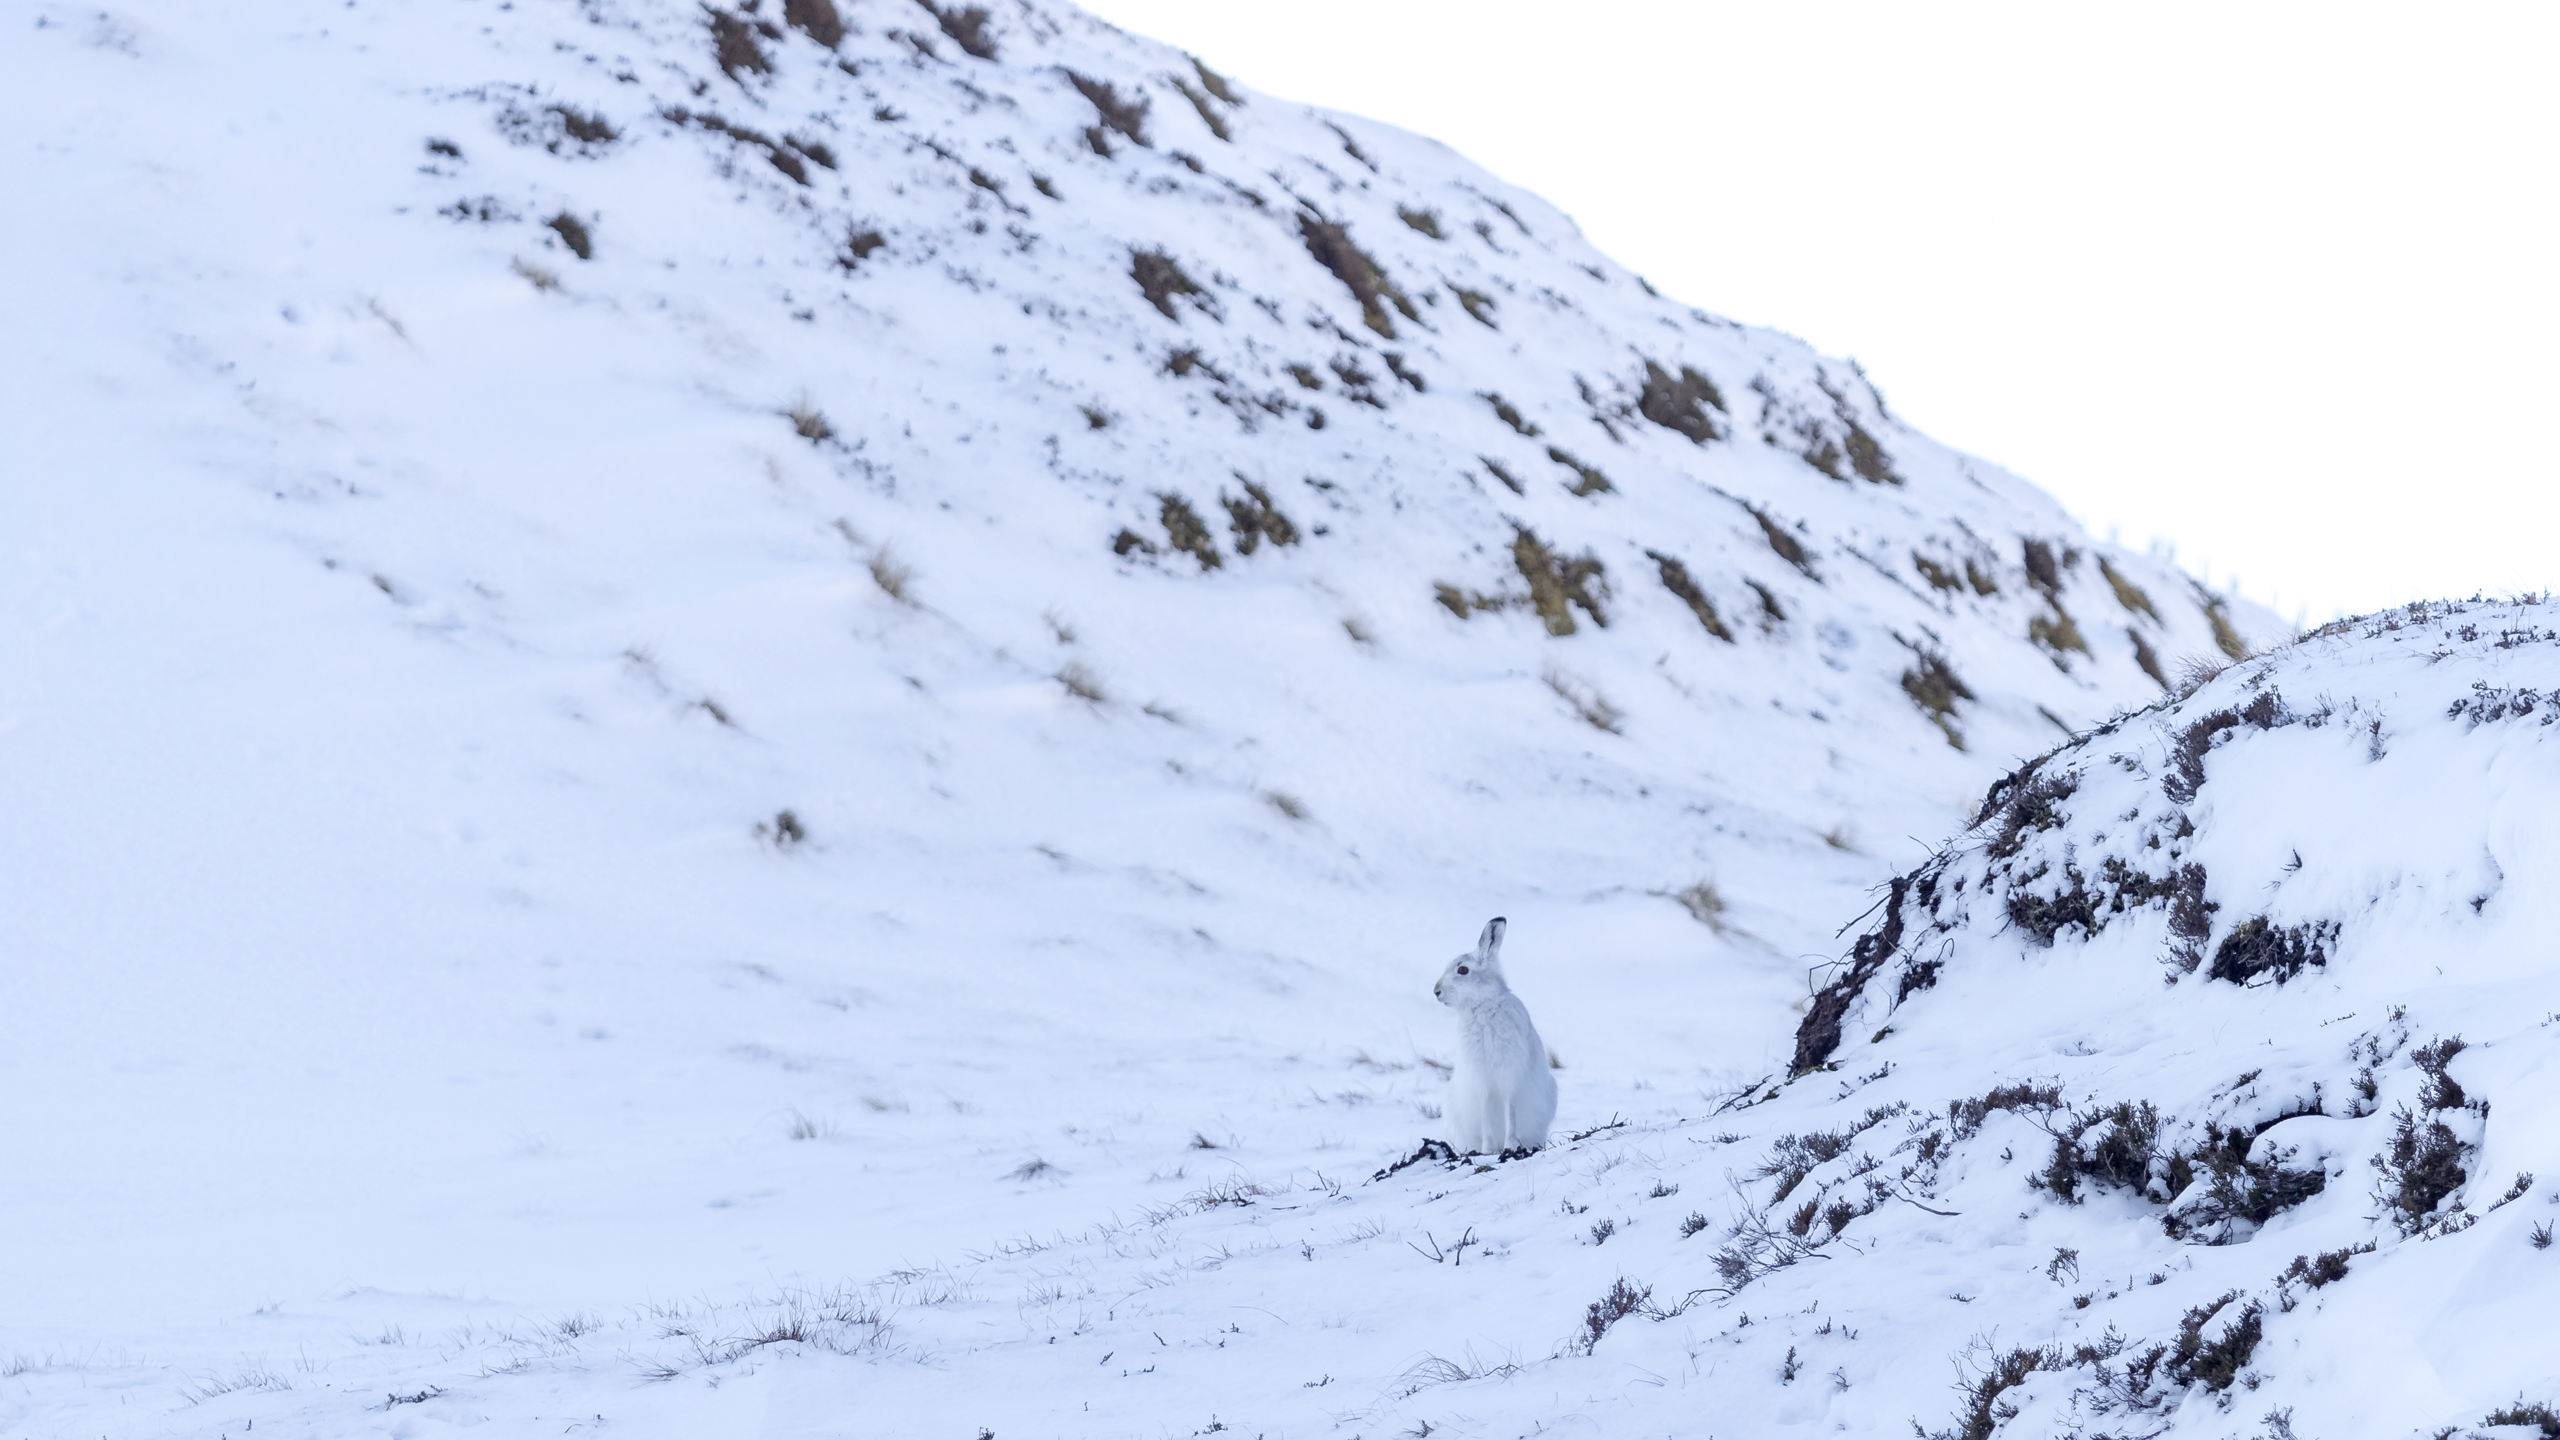 Mountain Hare sitting on watch duty